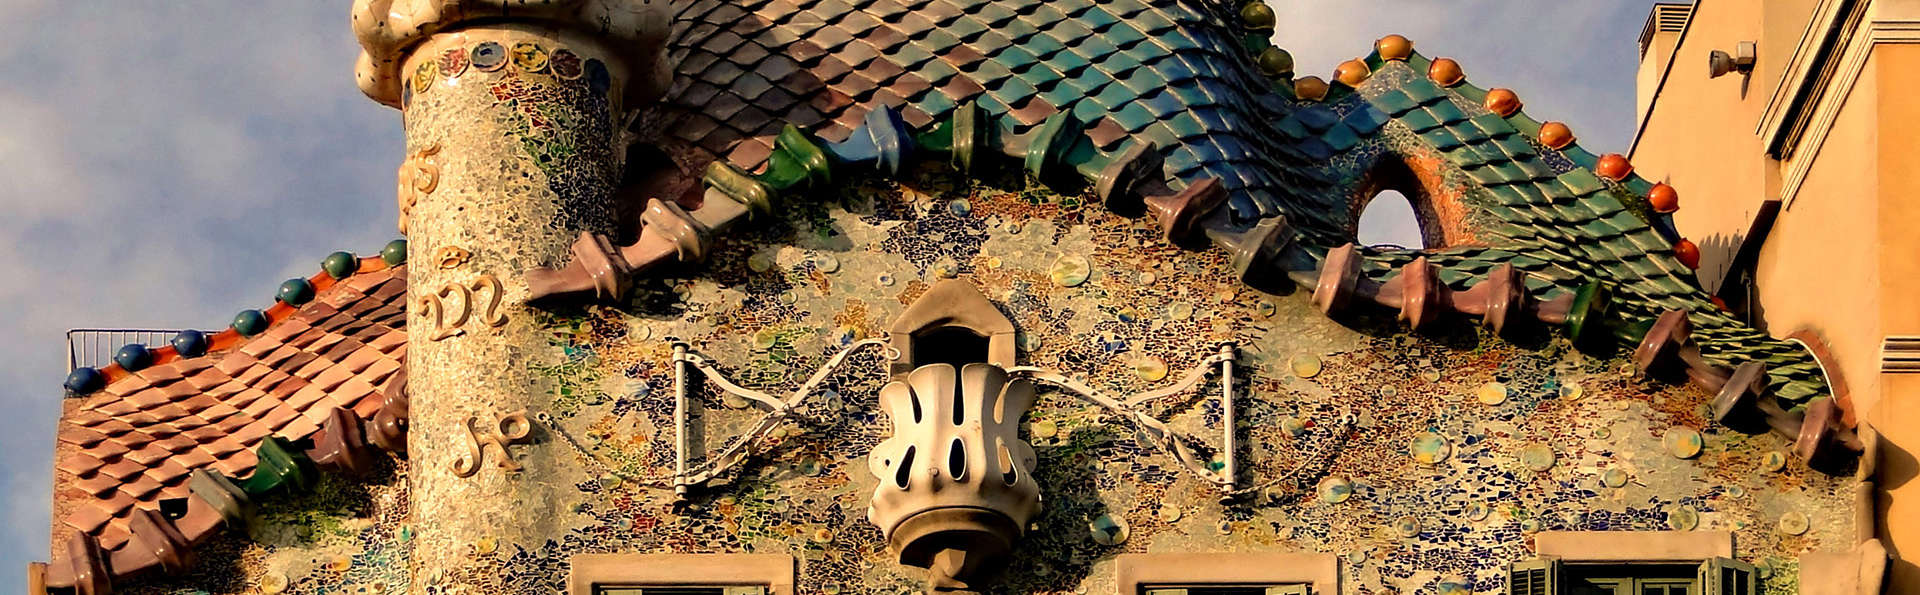 Abba Sants Hotel - EDIT_destination.jpg